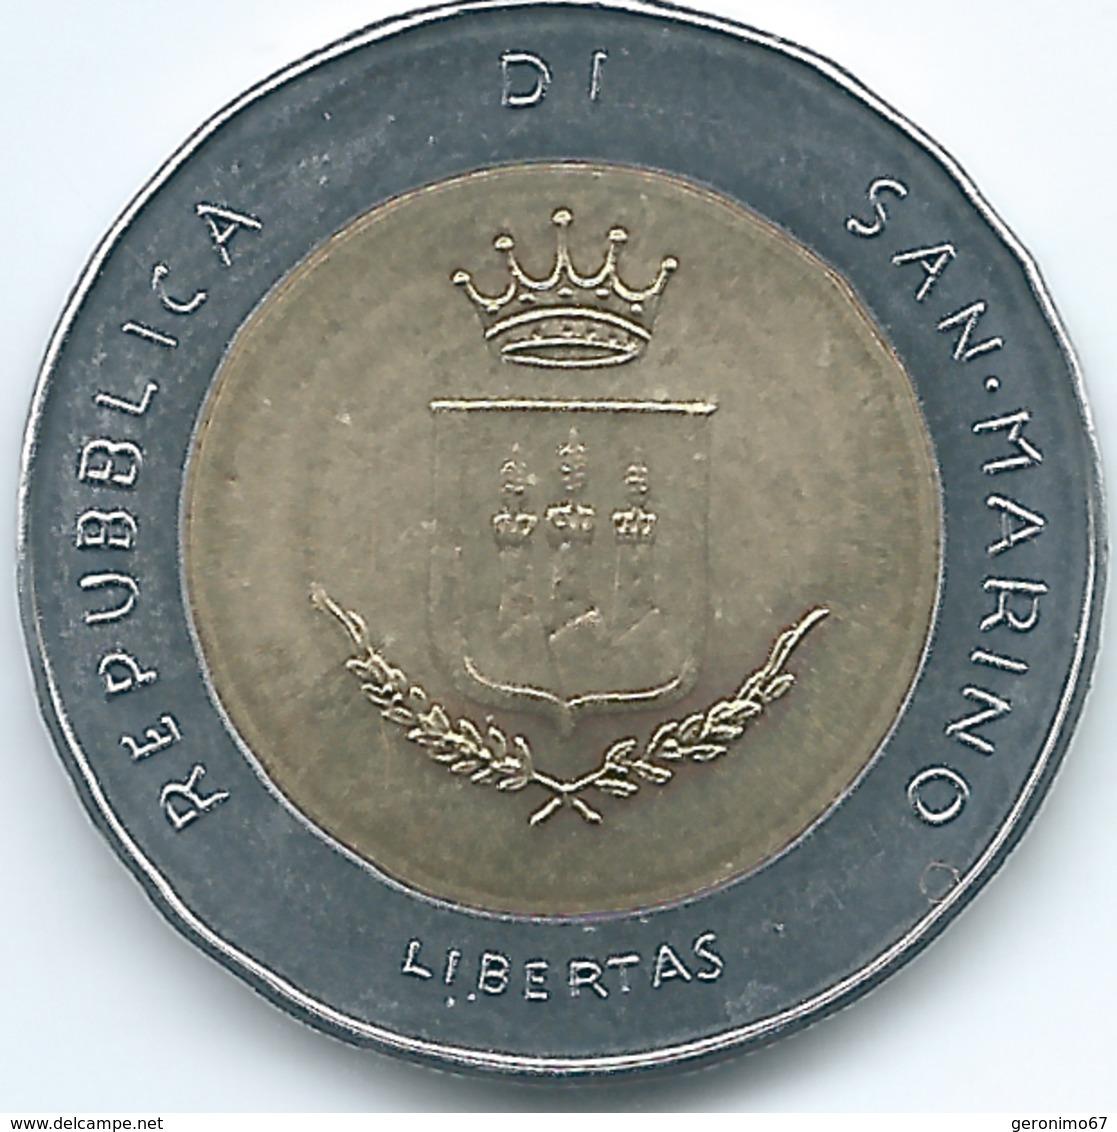 San Marino - 1983 - 500 Lire - KM153 - San Marino